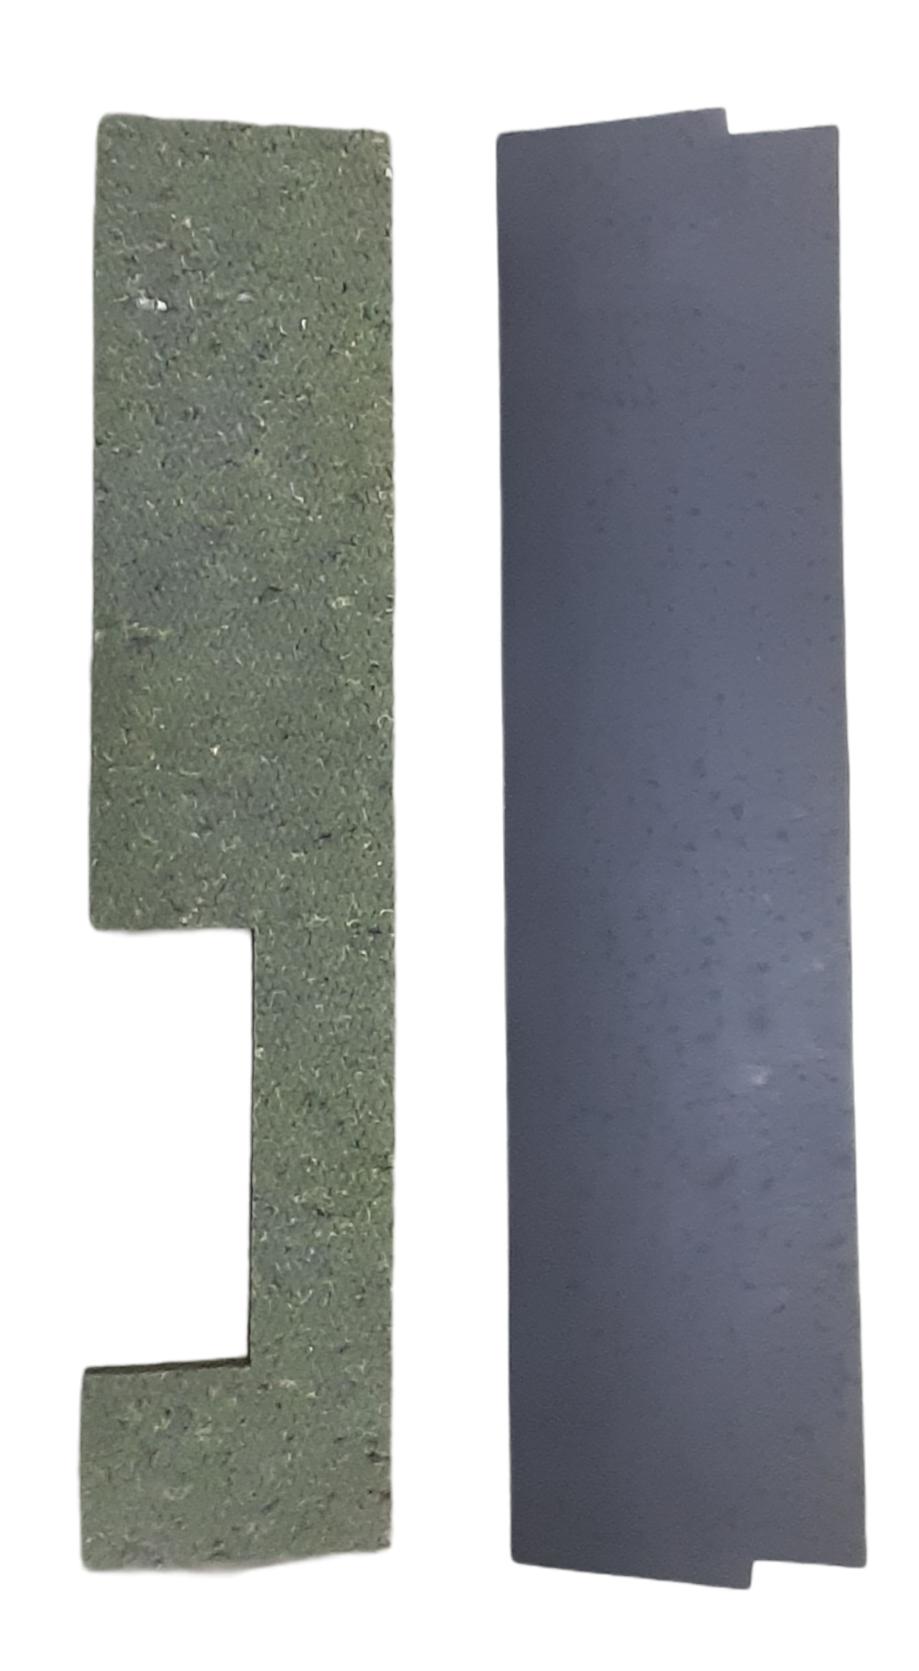 Pedalbodendämmung (Dämm-Material + Schwerschicht beides selbstklebend) Set, 2CV / AK